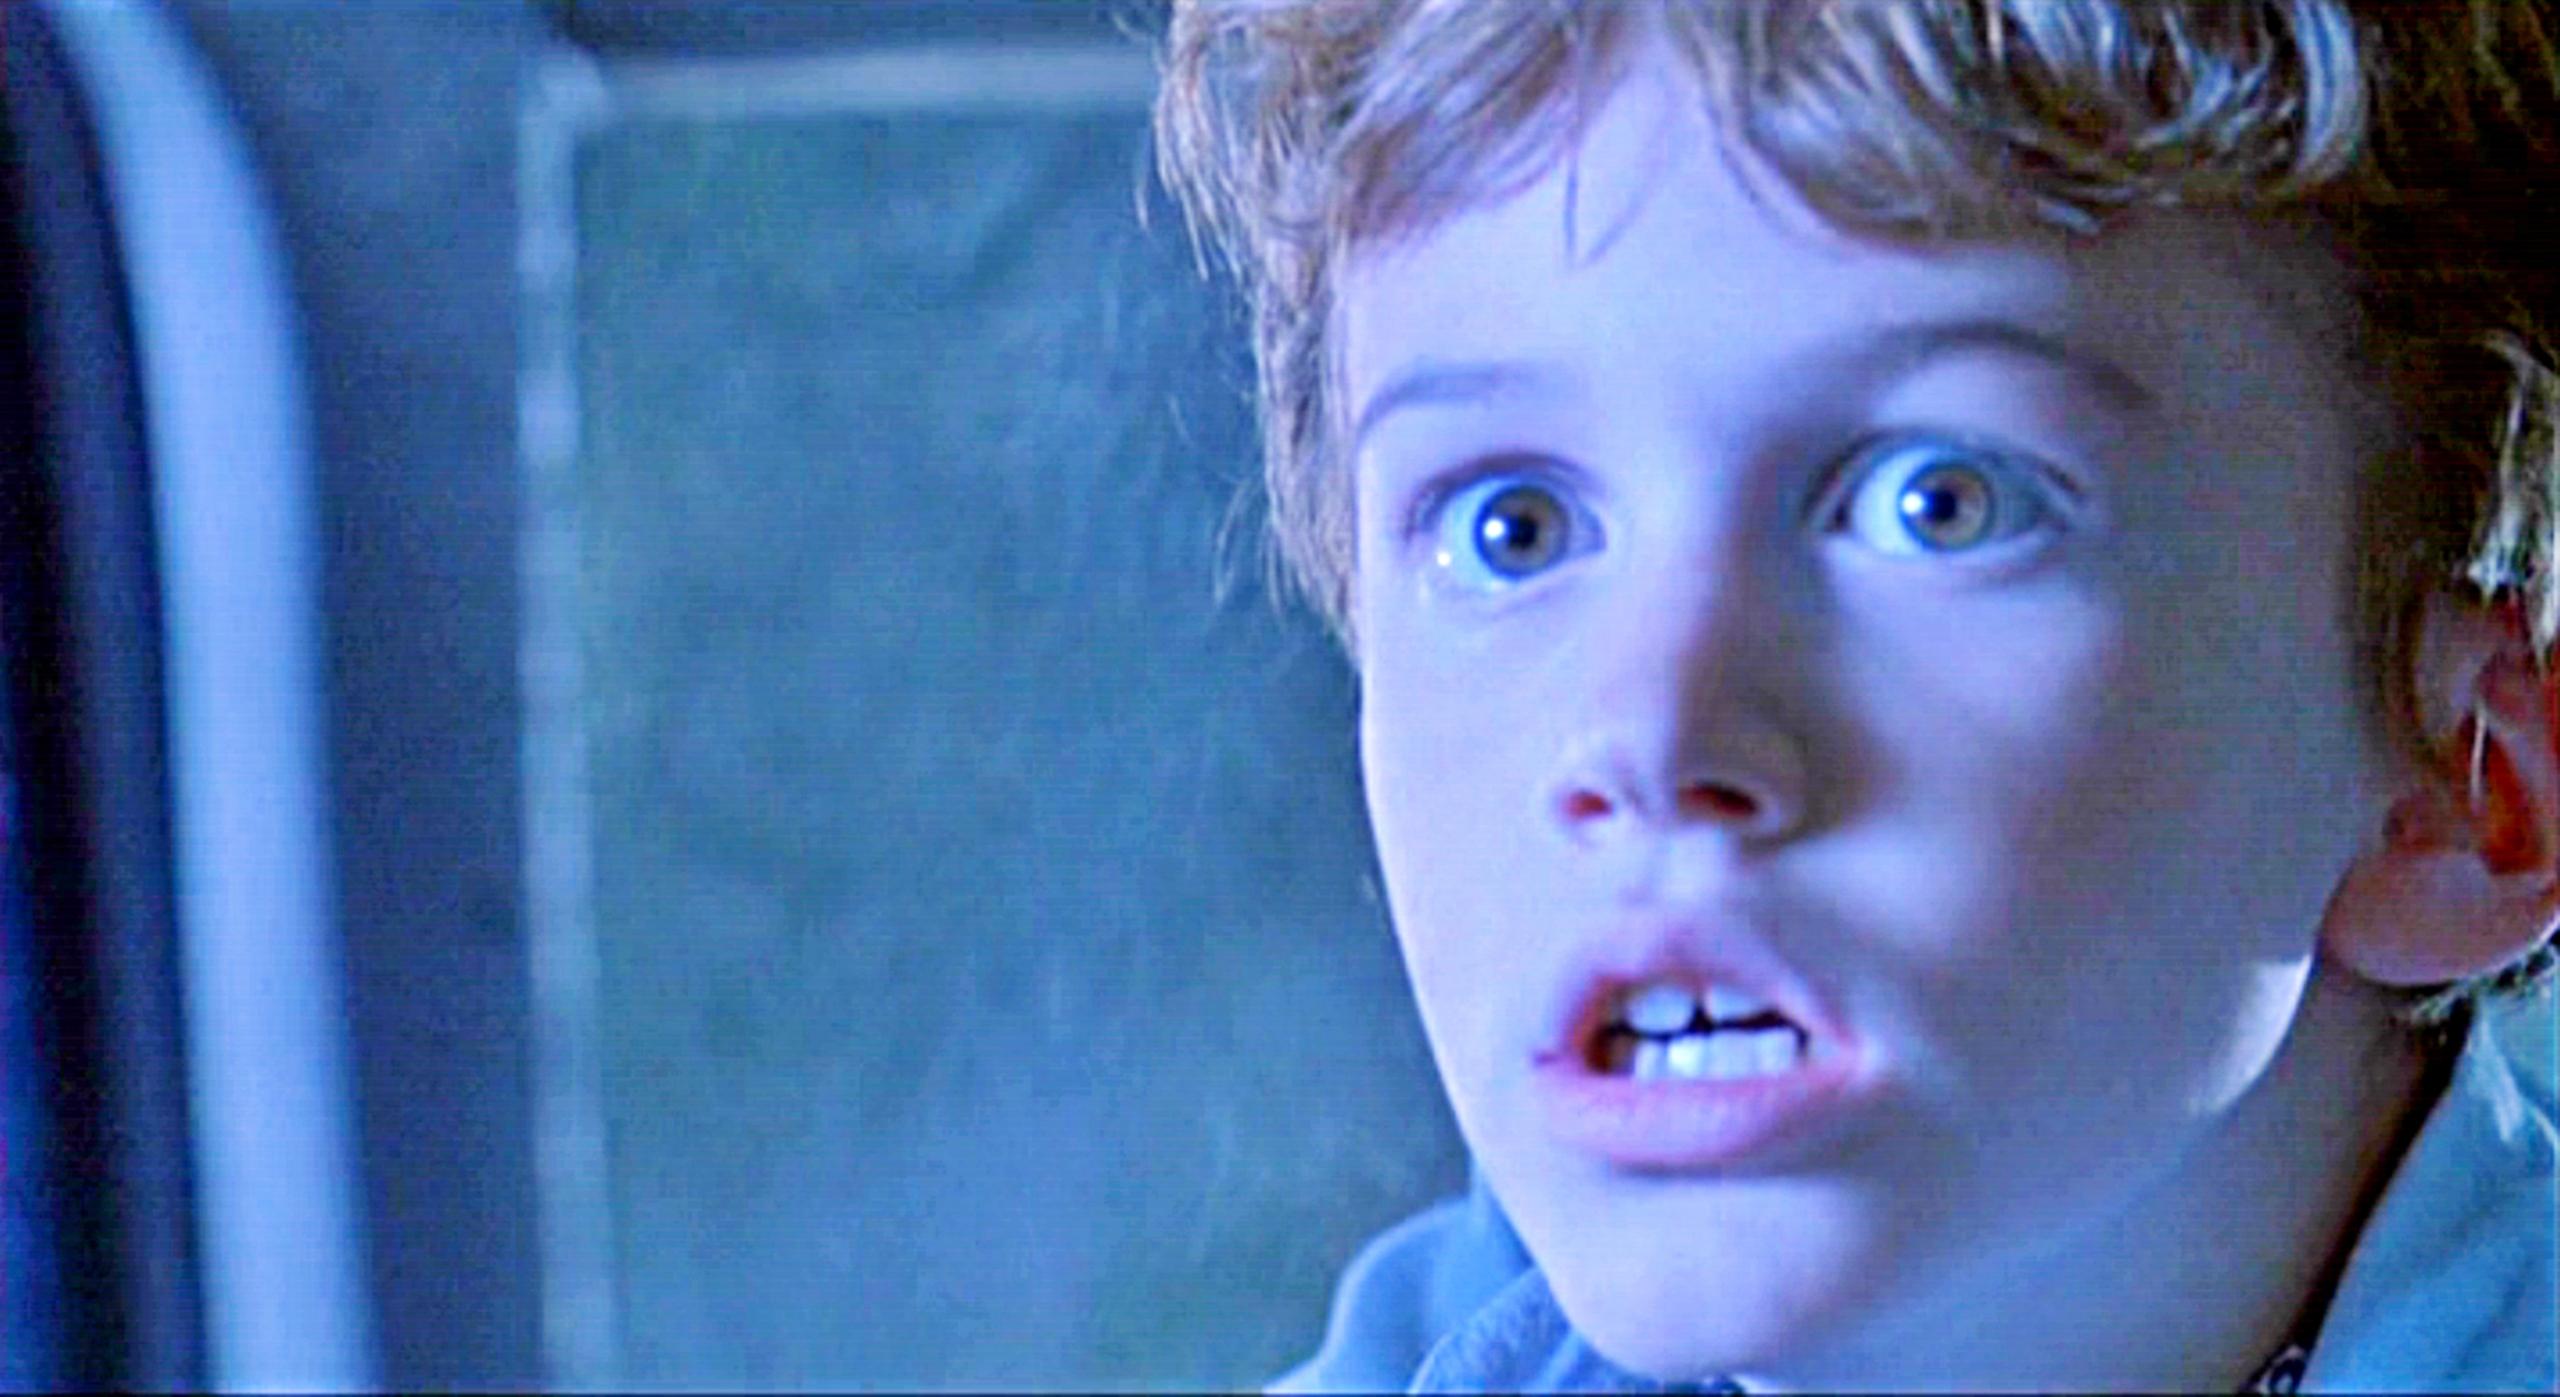 Jurassic Park Screencaps - Timothy Murphy (Tim)